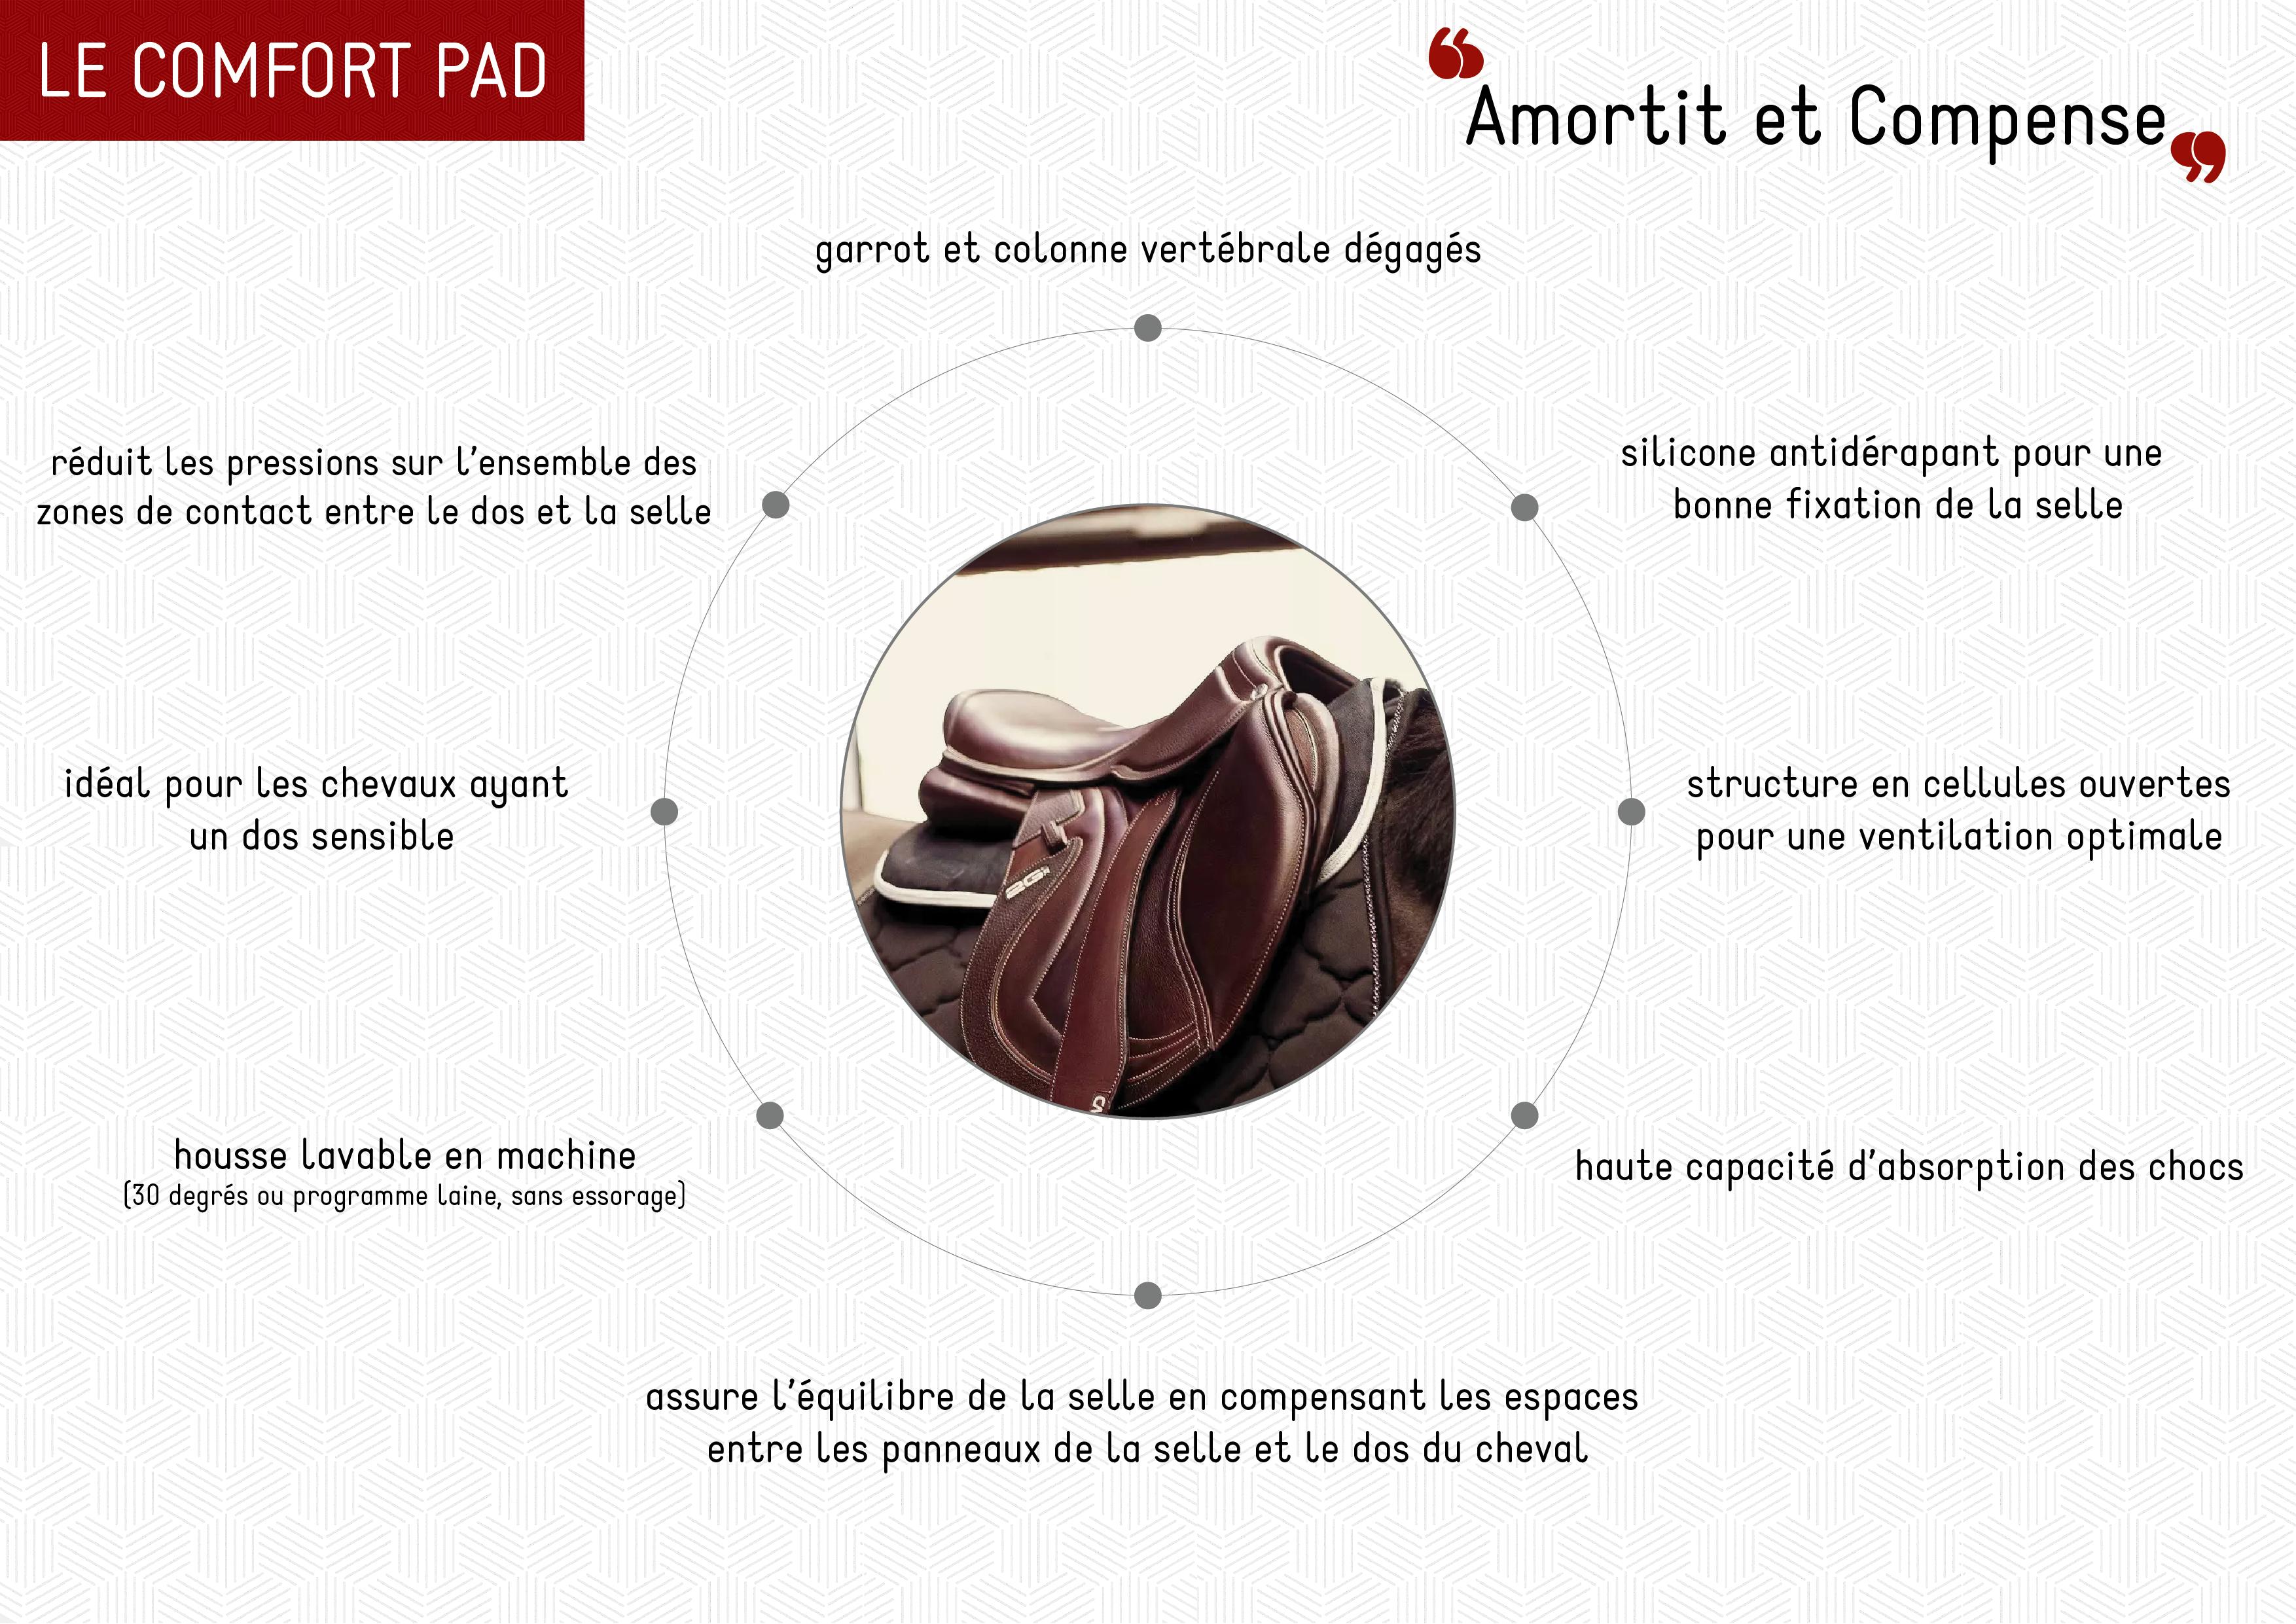 amortisseur comfort pad cwd